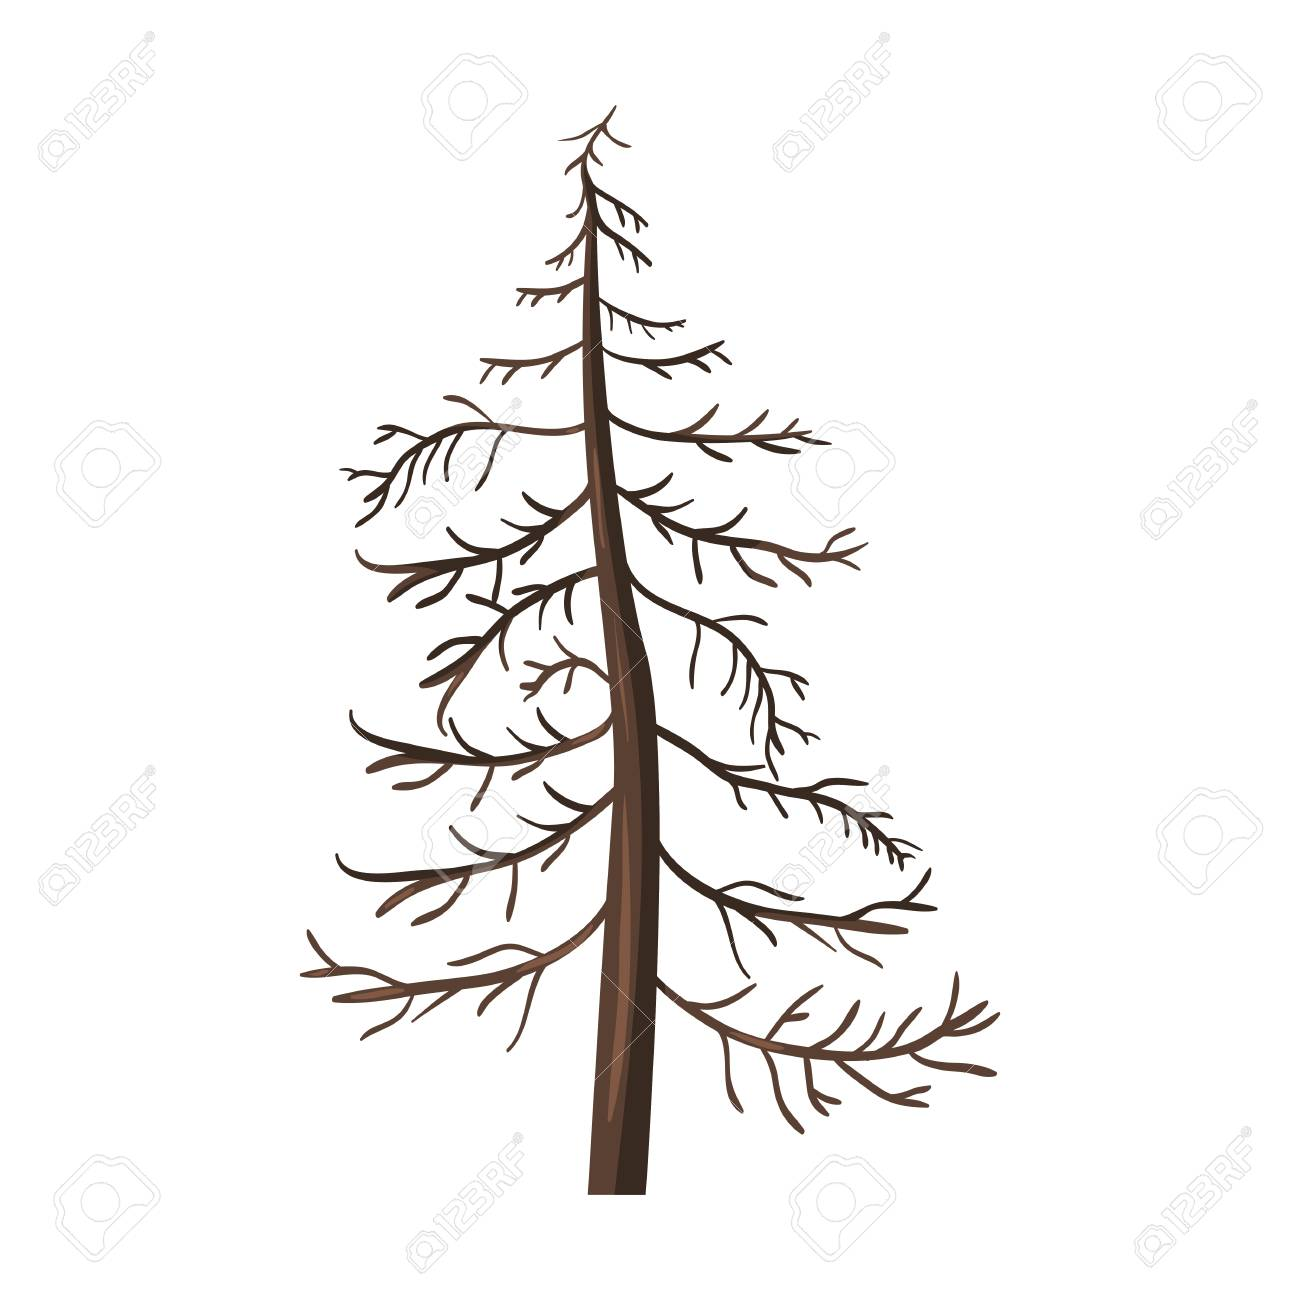 Vector Single Cartoon Brown Bare Pine Tree on White Background.